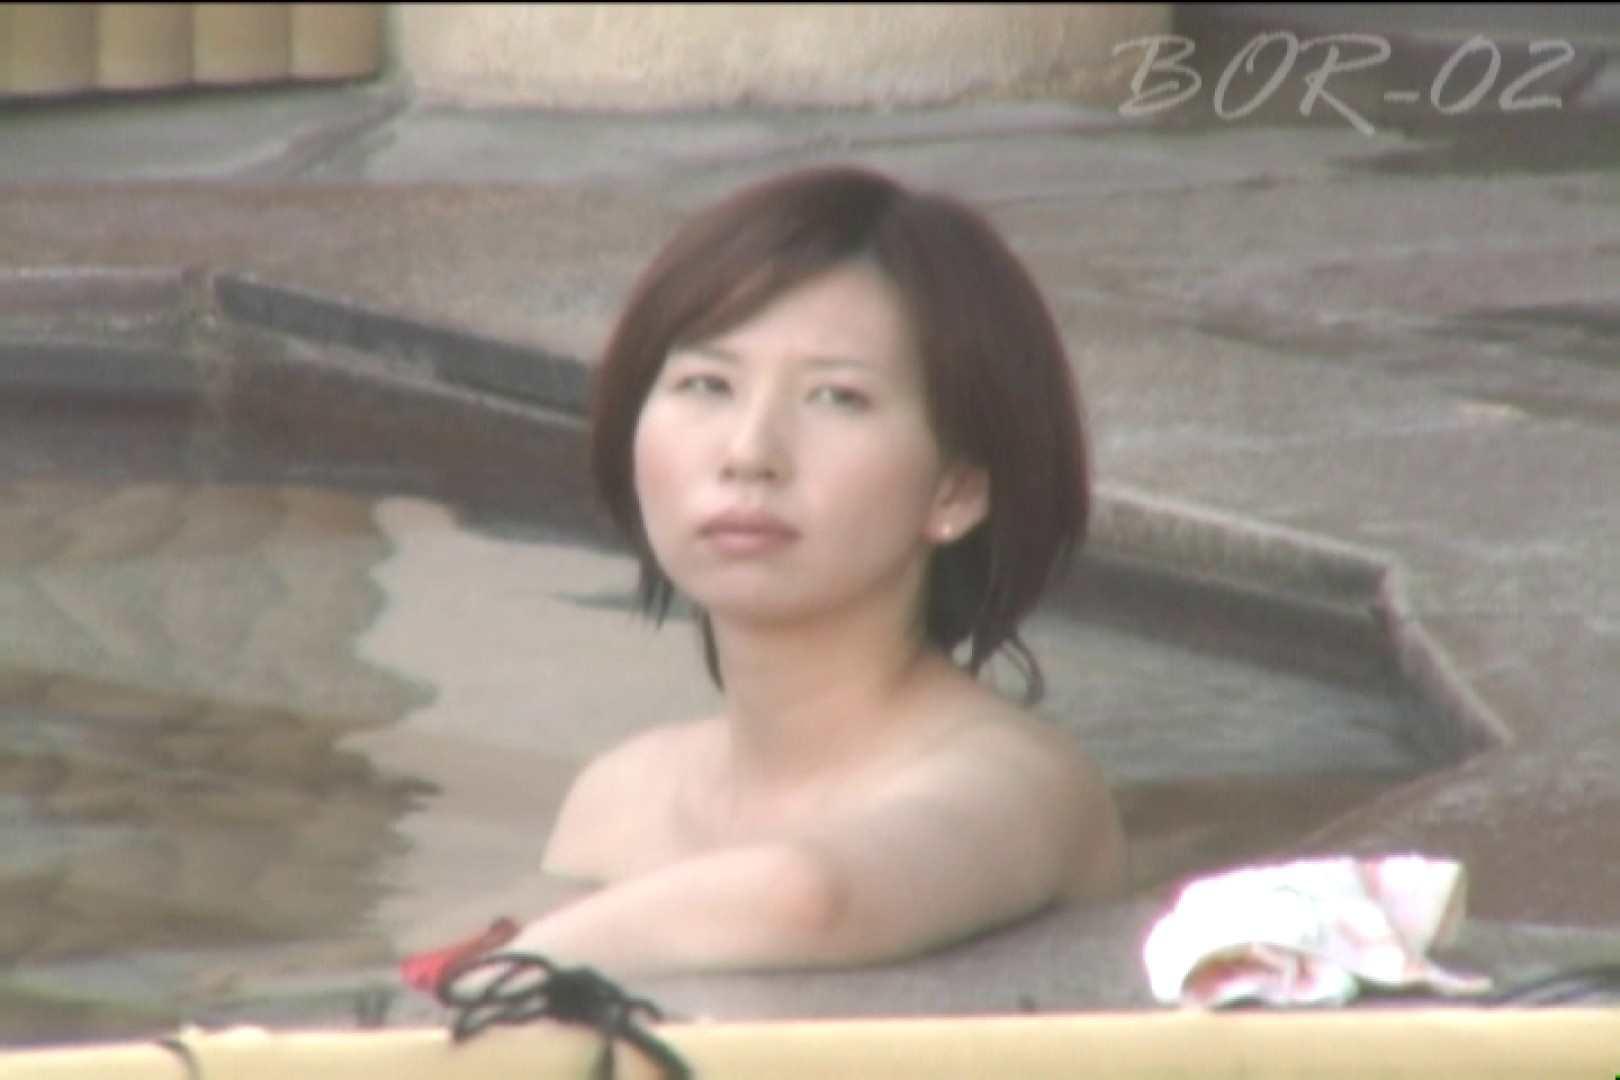 Aquaな露天風呂Vol.476 盗撮 濡れ場動画紹介 80画像 5